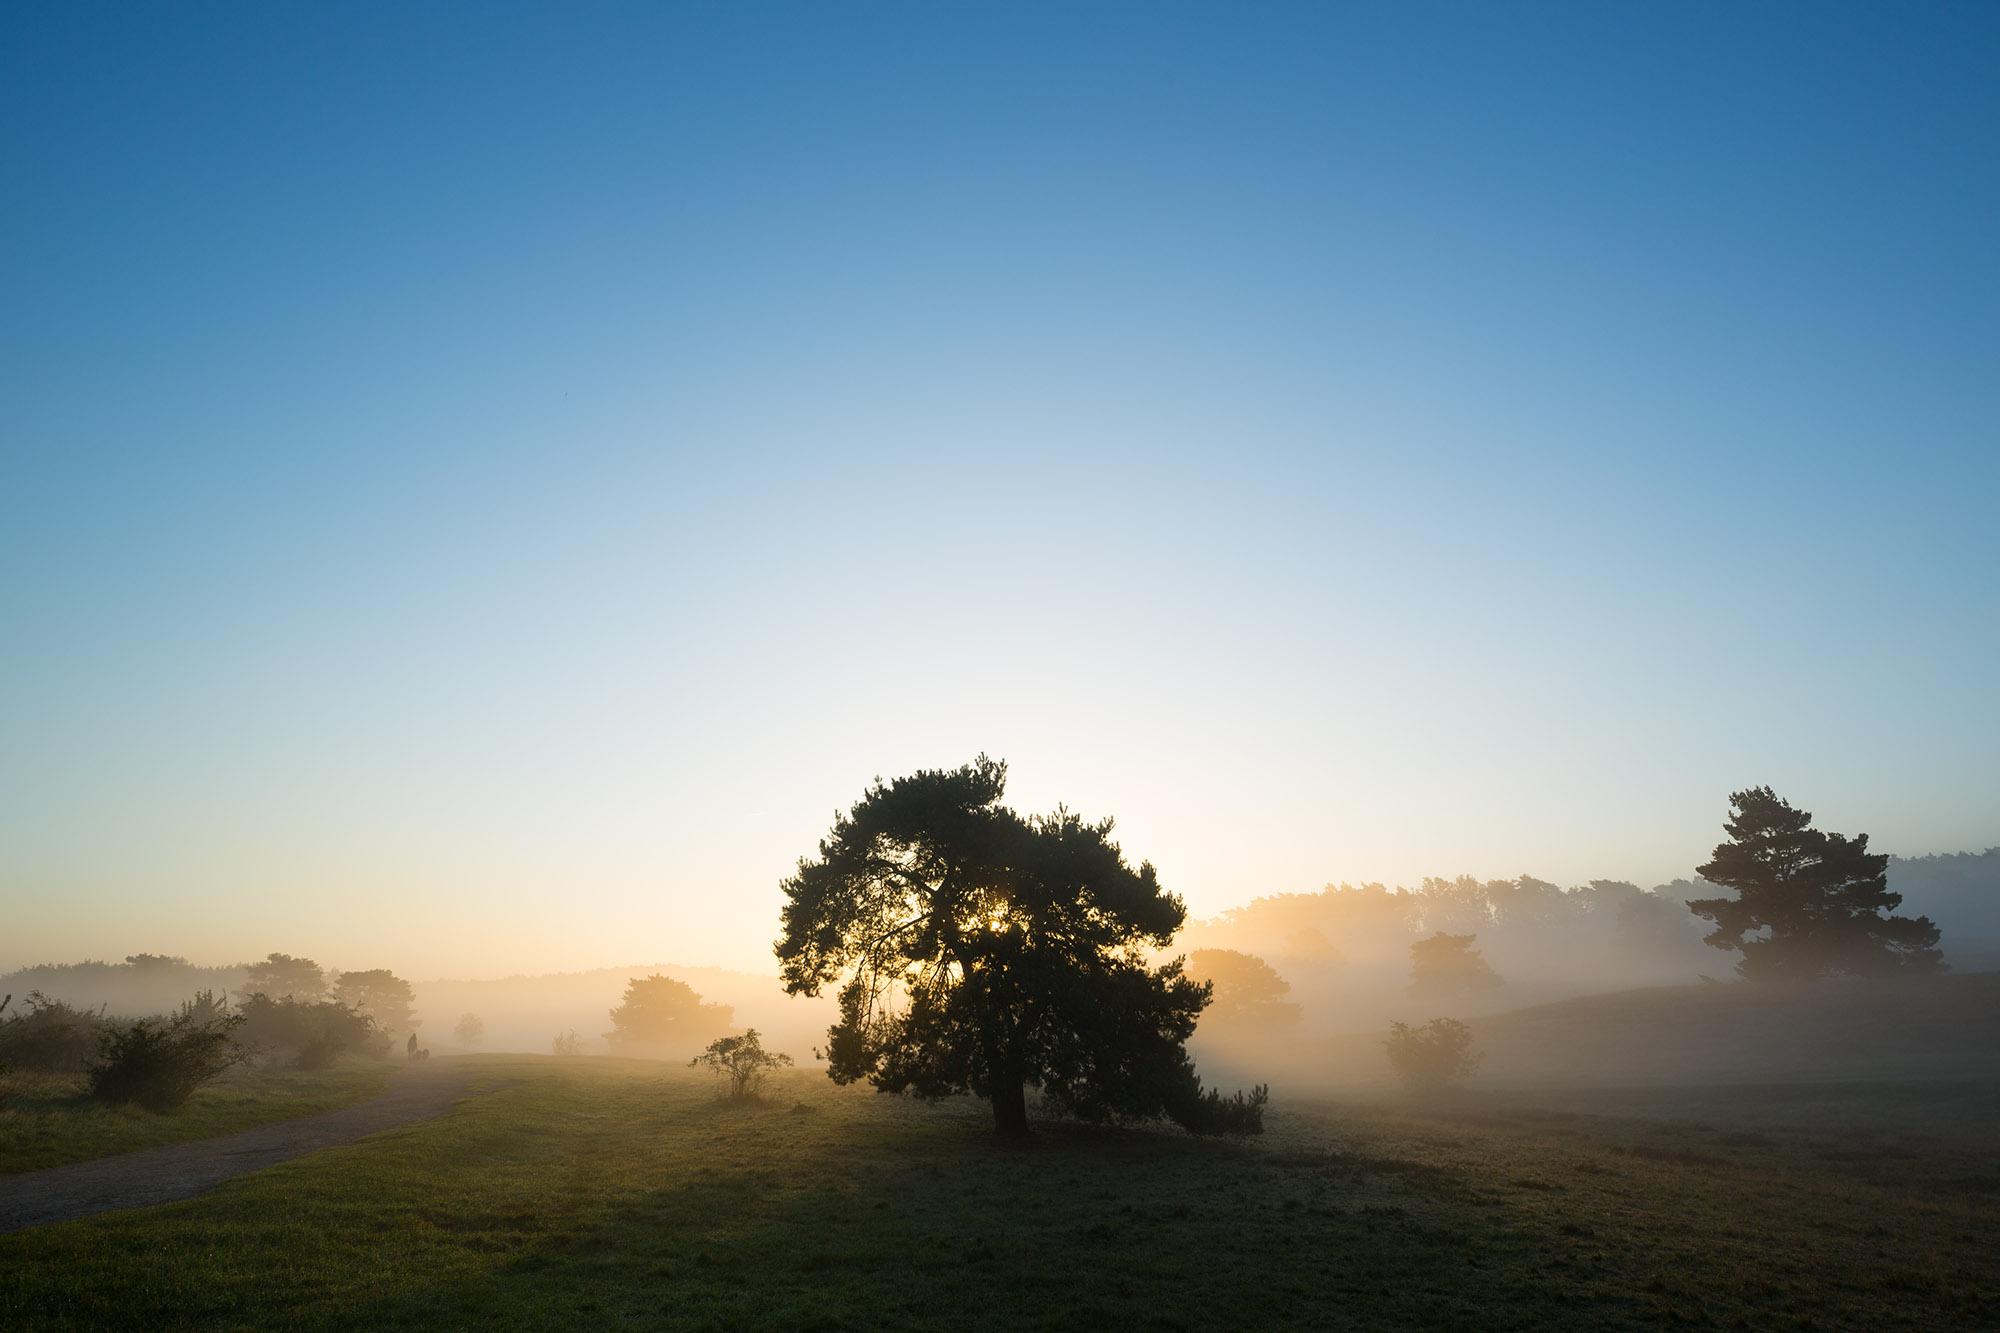 SPUISERS brunssummerheide landschap fotografie